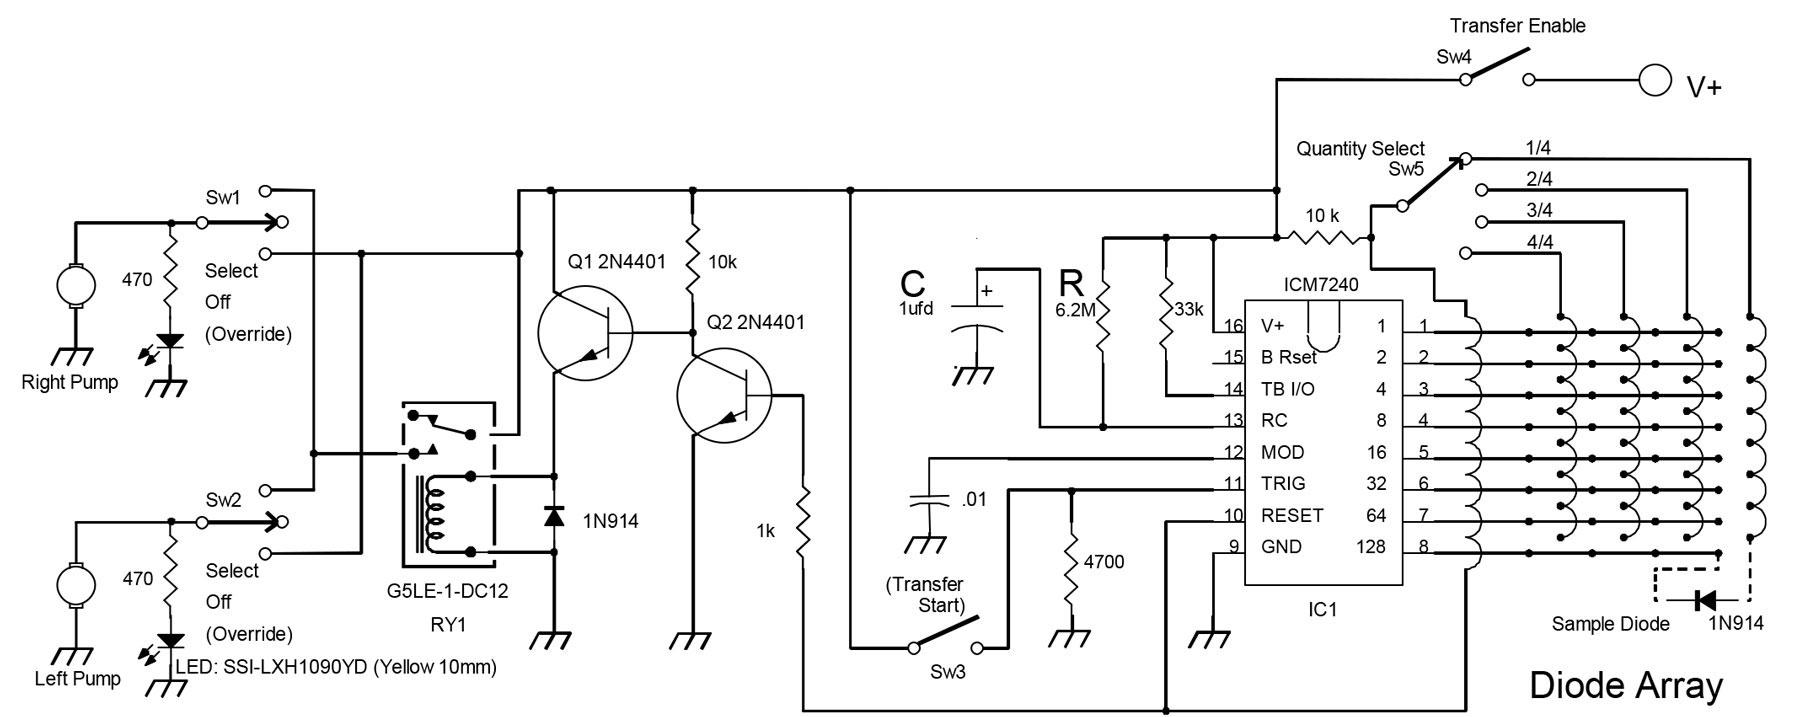 Figure 1. Schematic Diagram, Digital TDR Fuel Transfer Controller